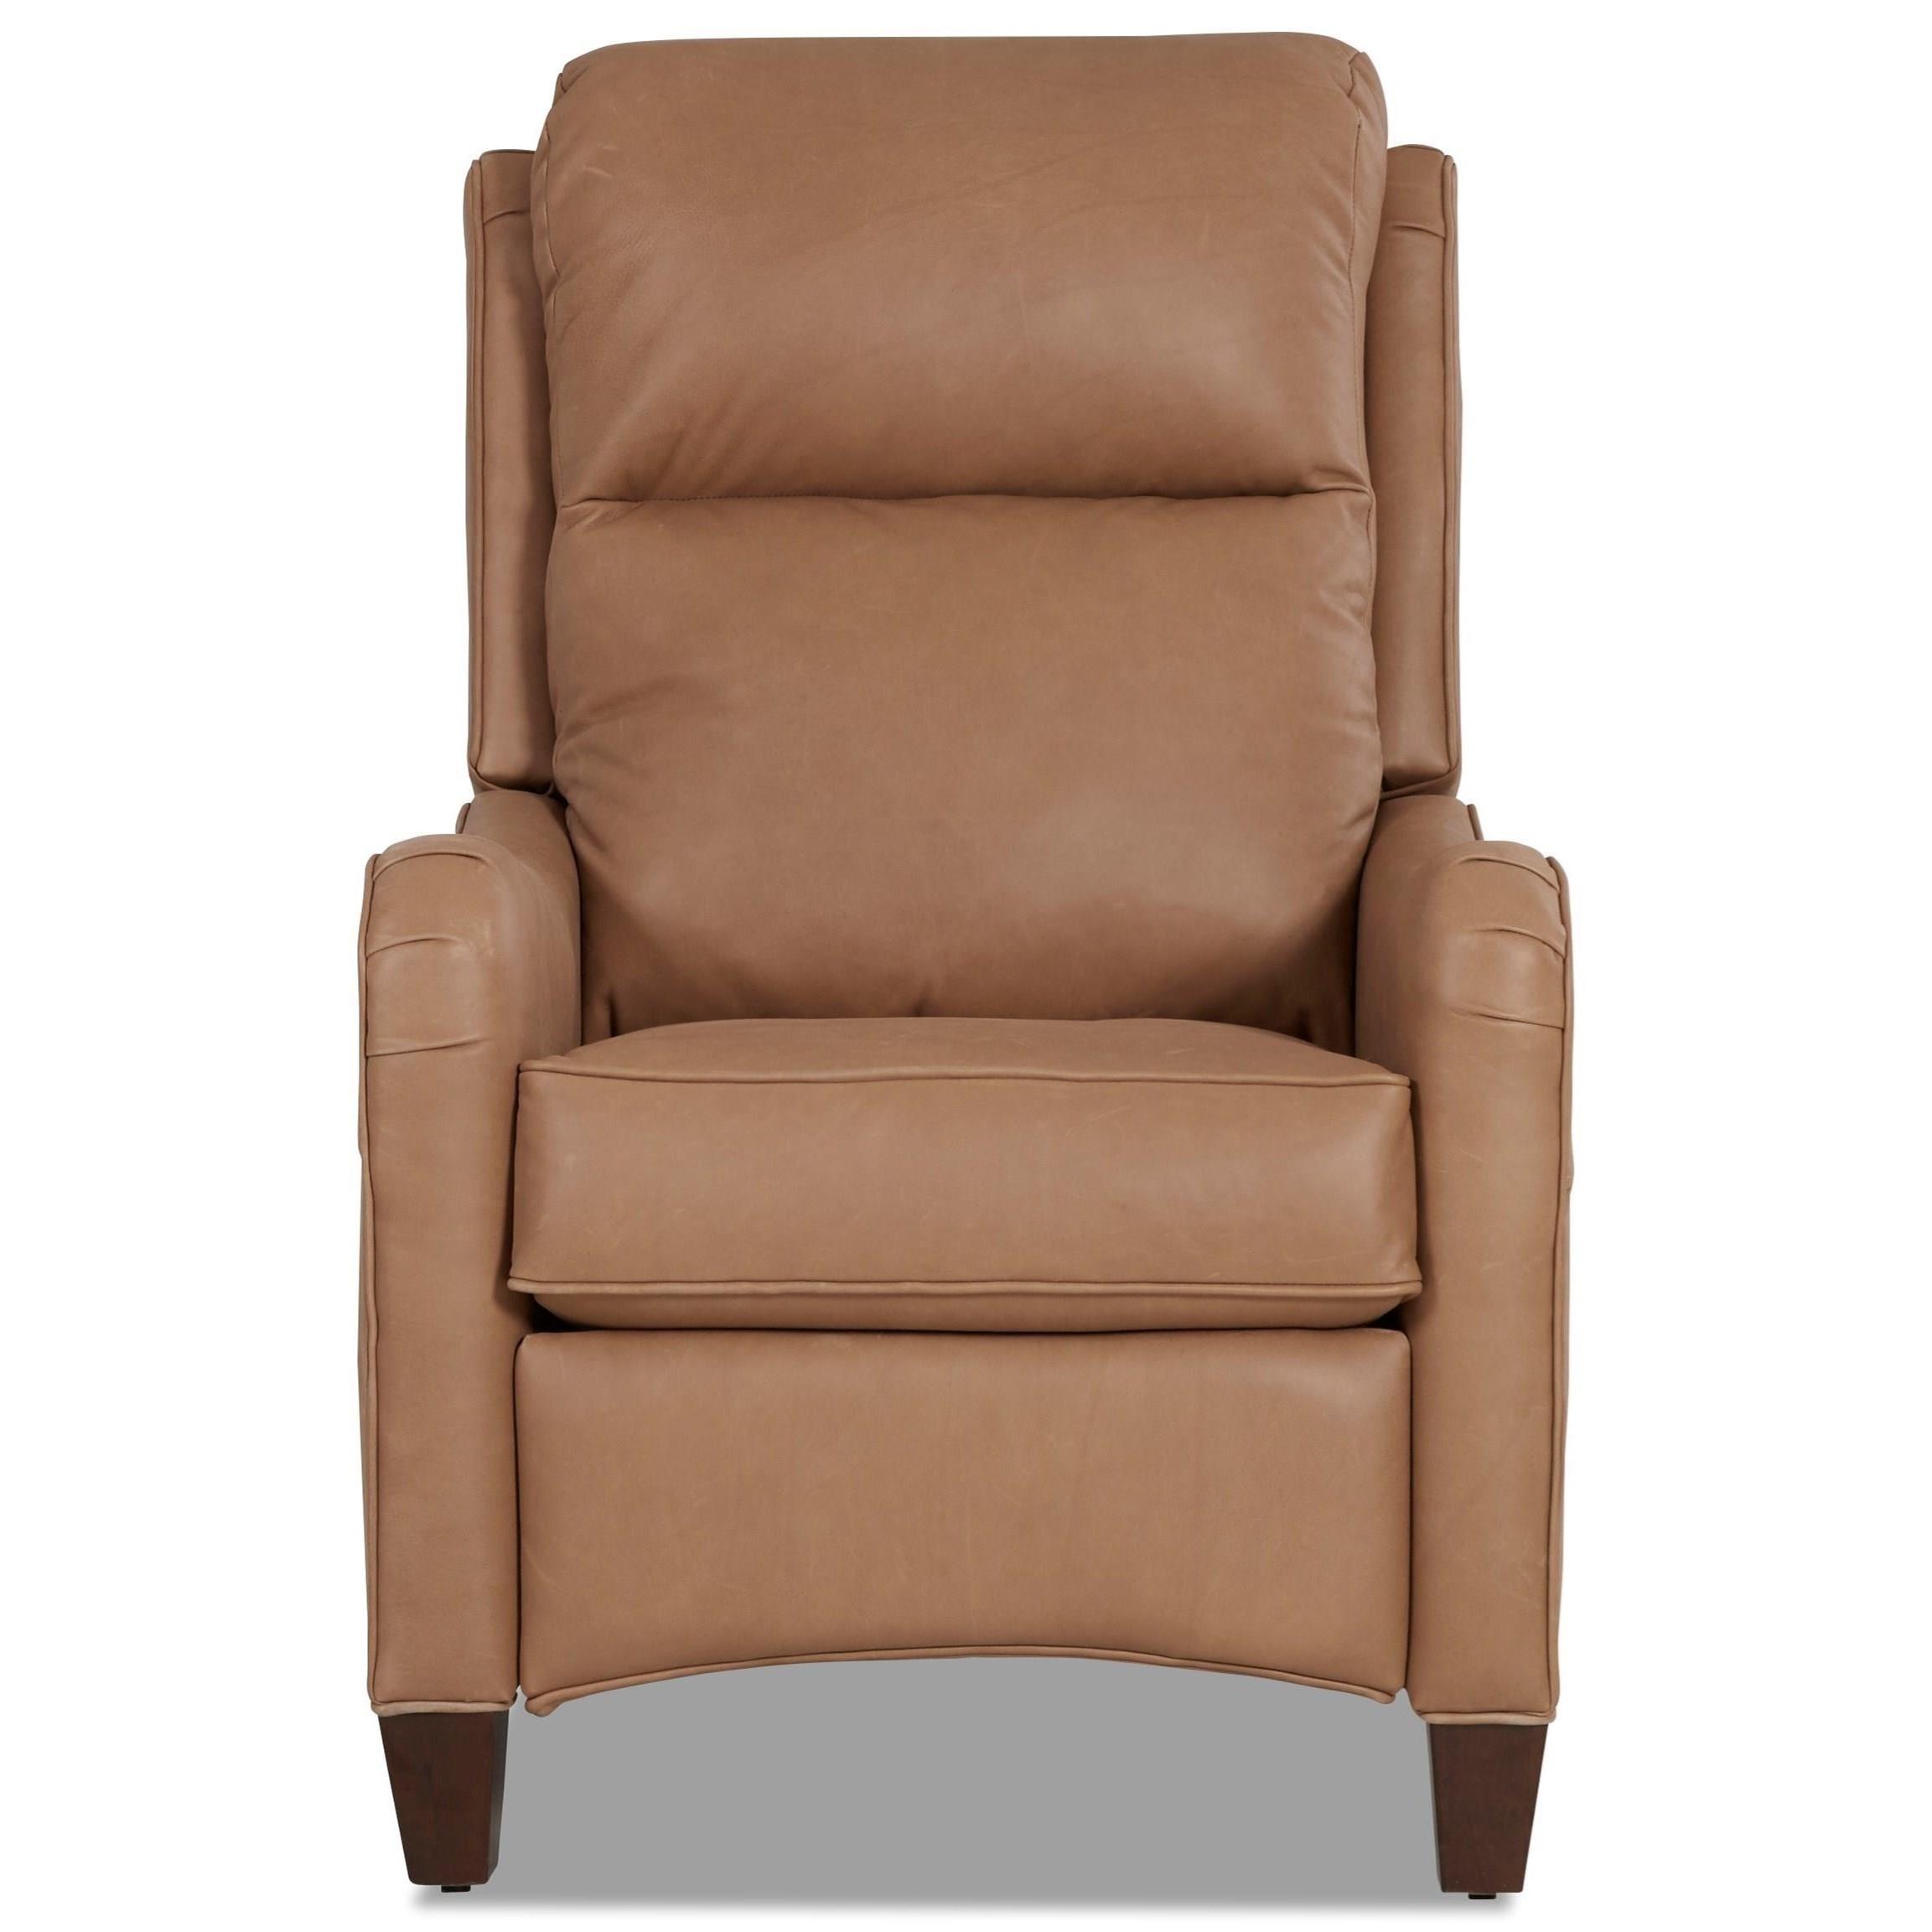 Power High Leg Reclining Chair with XMS Technology